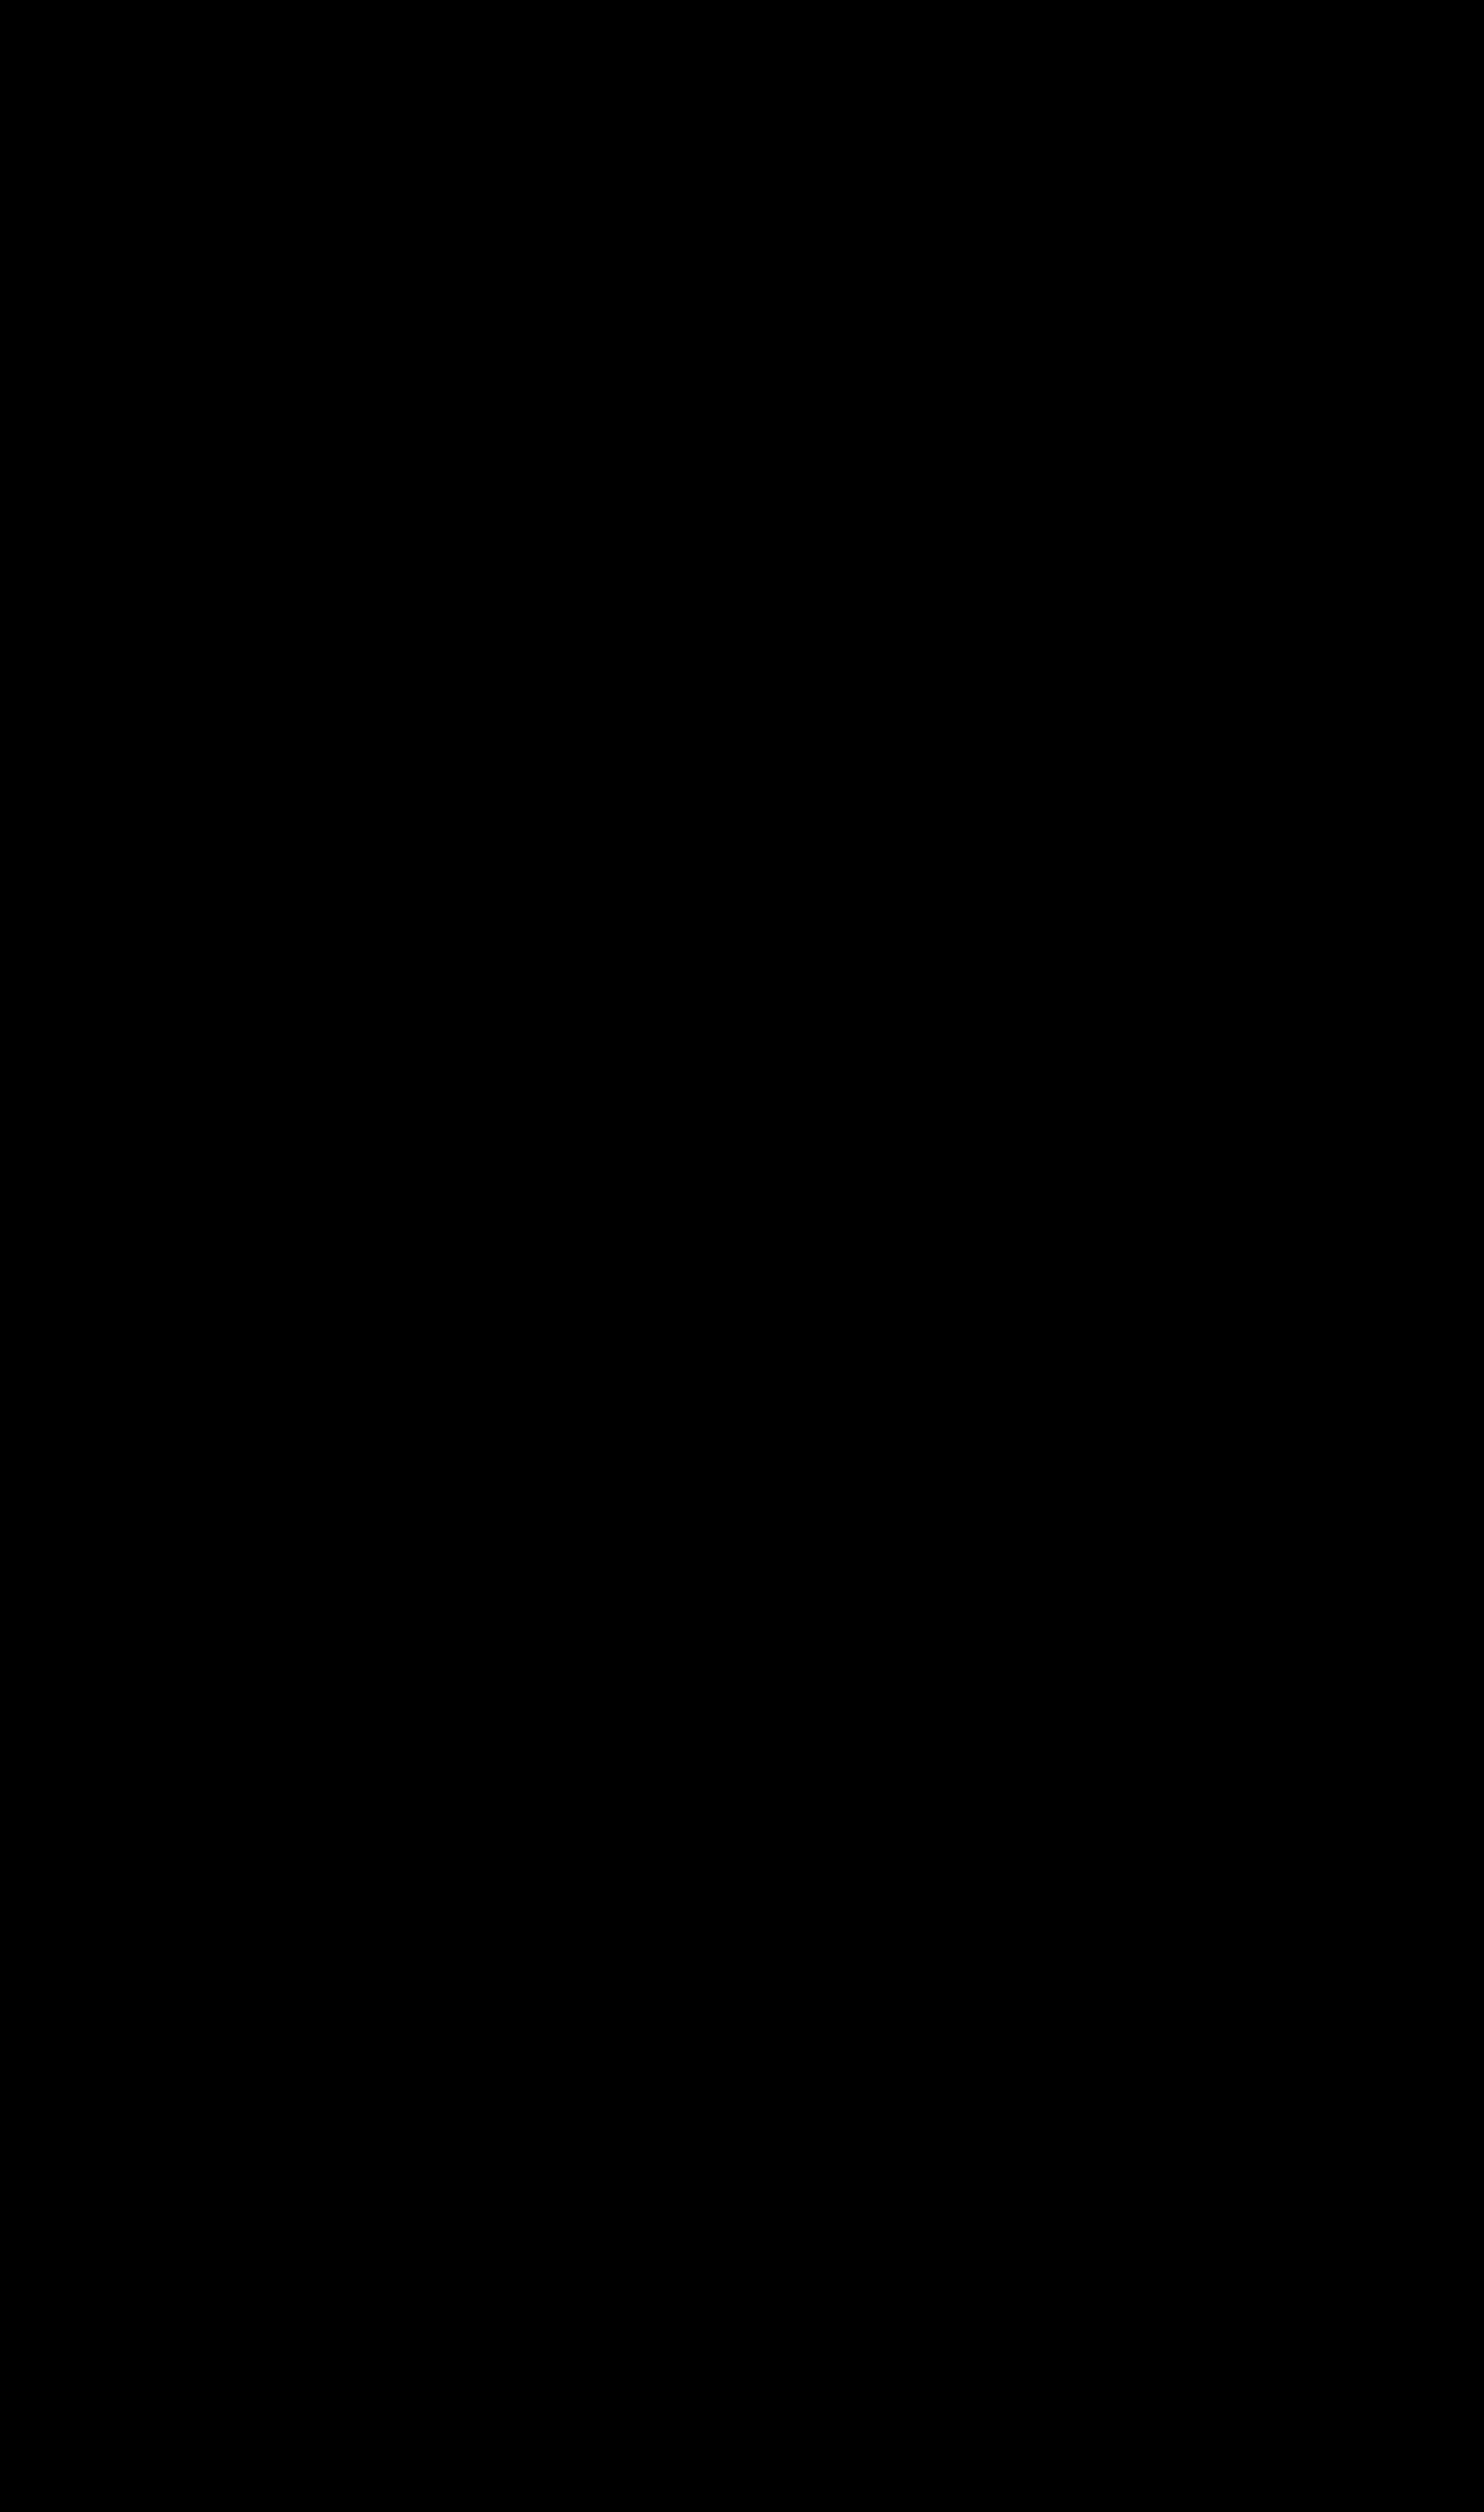 2000x3385 Filelight Bulb Silhouette.svg